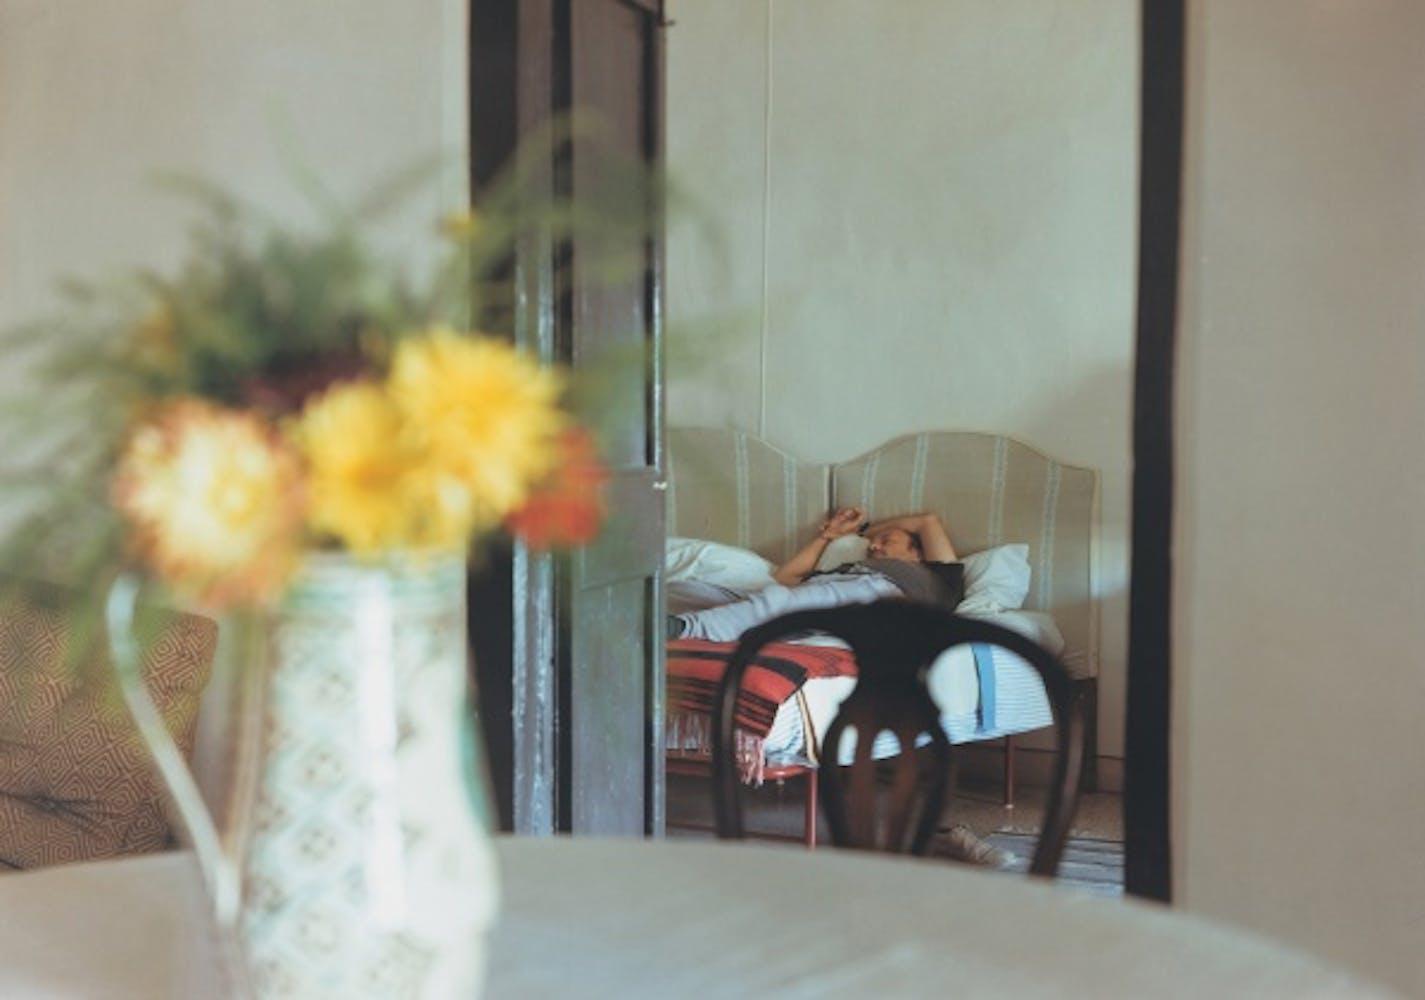 JoAnn Verburg, Untitled (Jim Sleeping, Spoleto), 1988